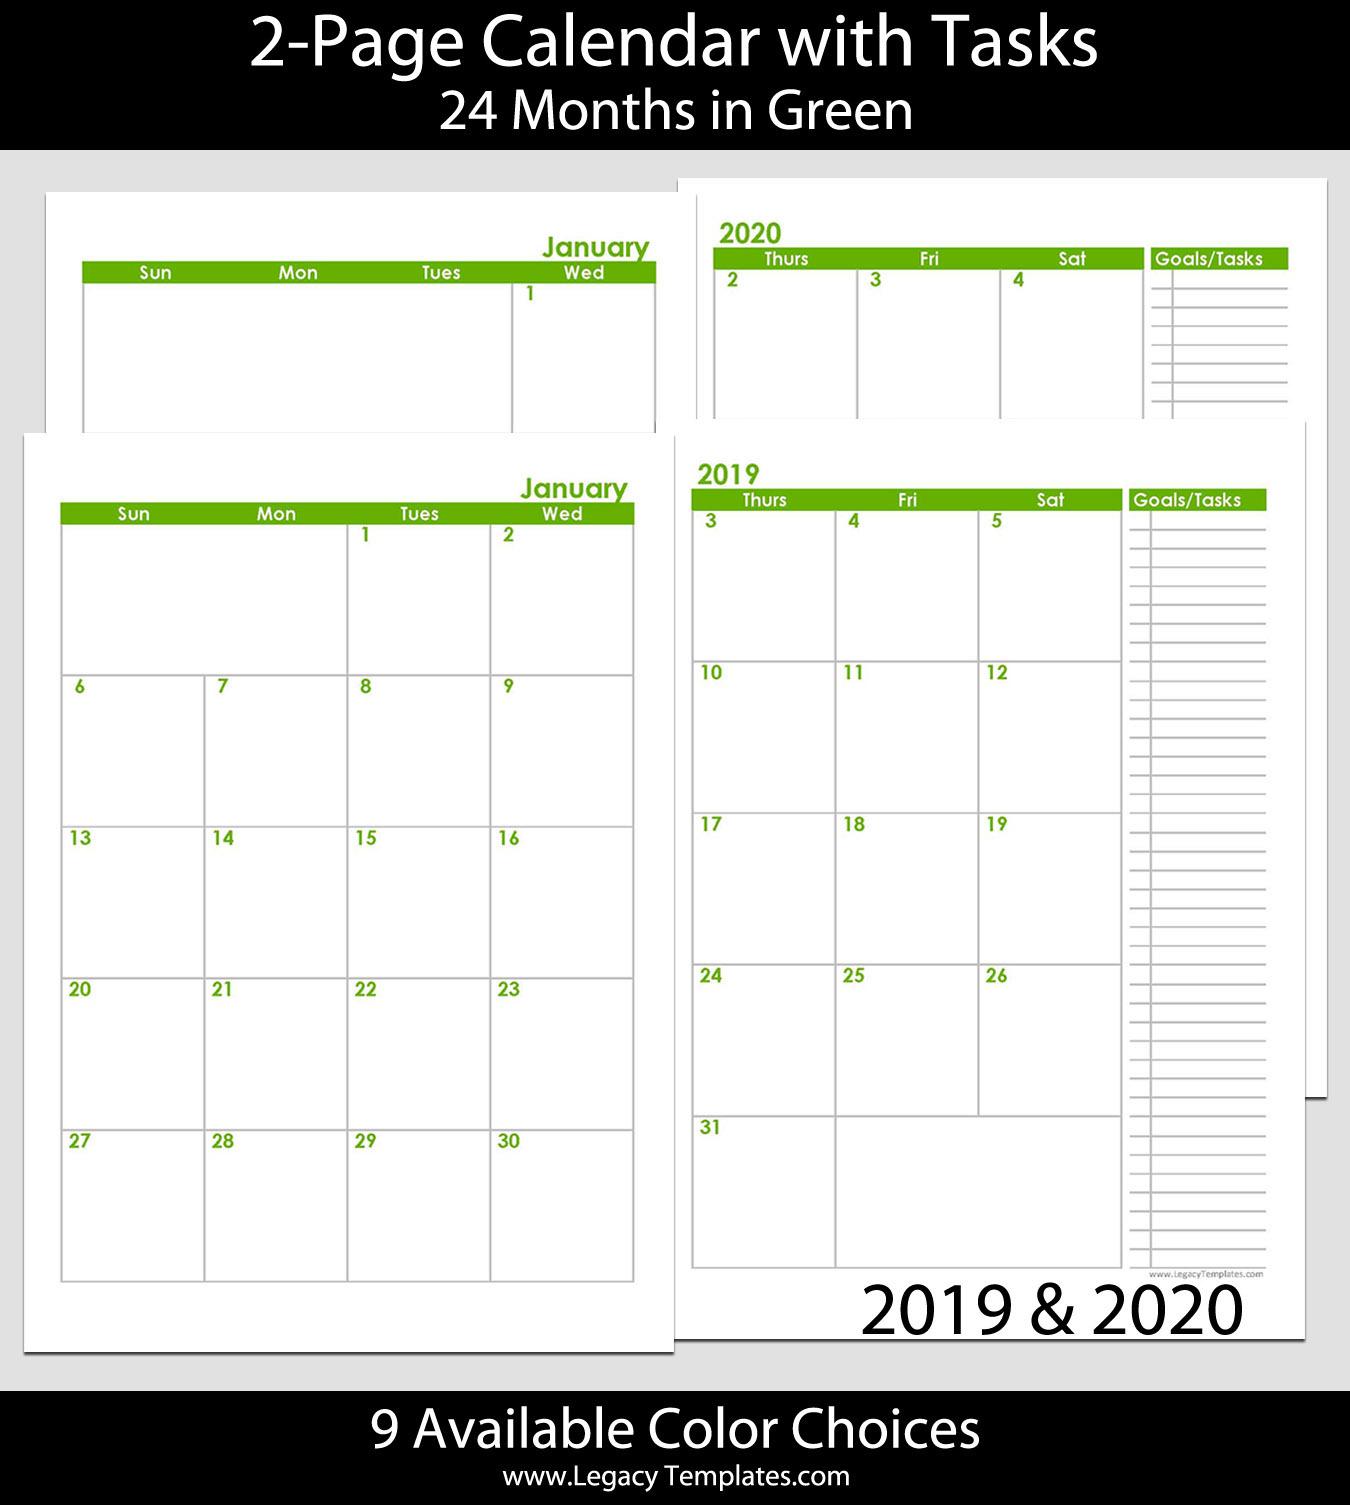 2019 & 2020 24-Months 2-Page Calendar – A5 | Legacy Templates